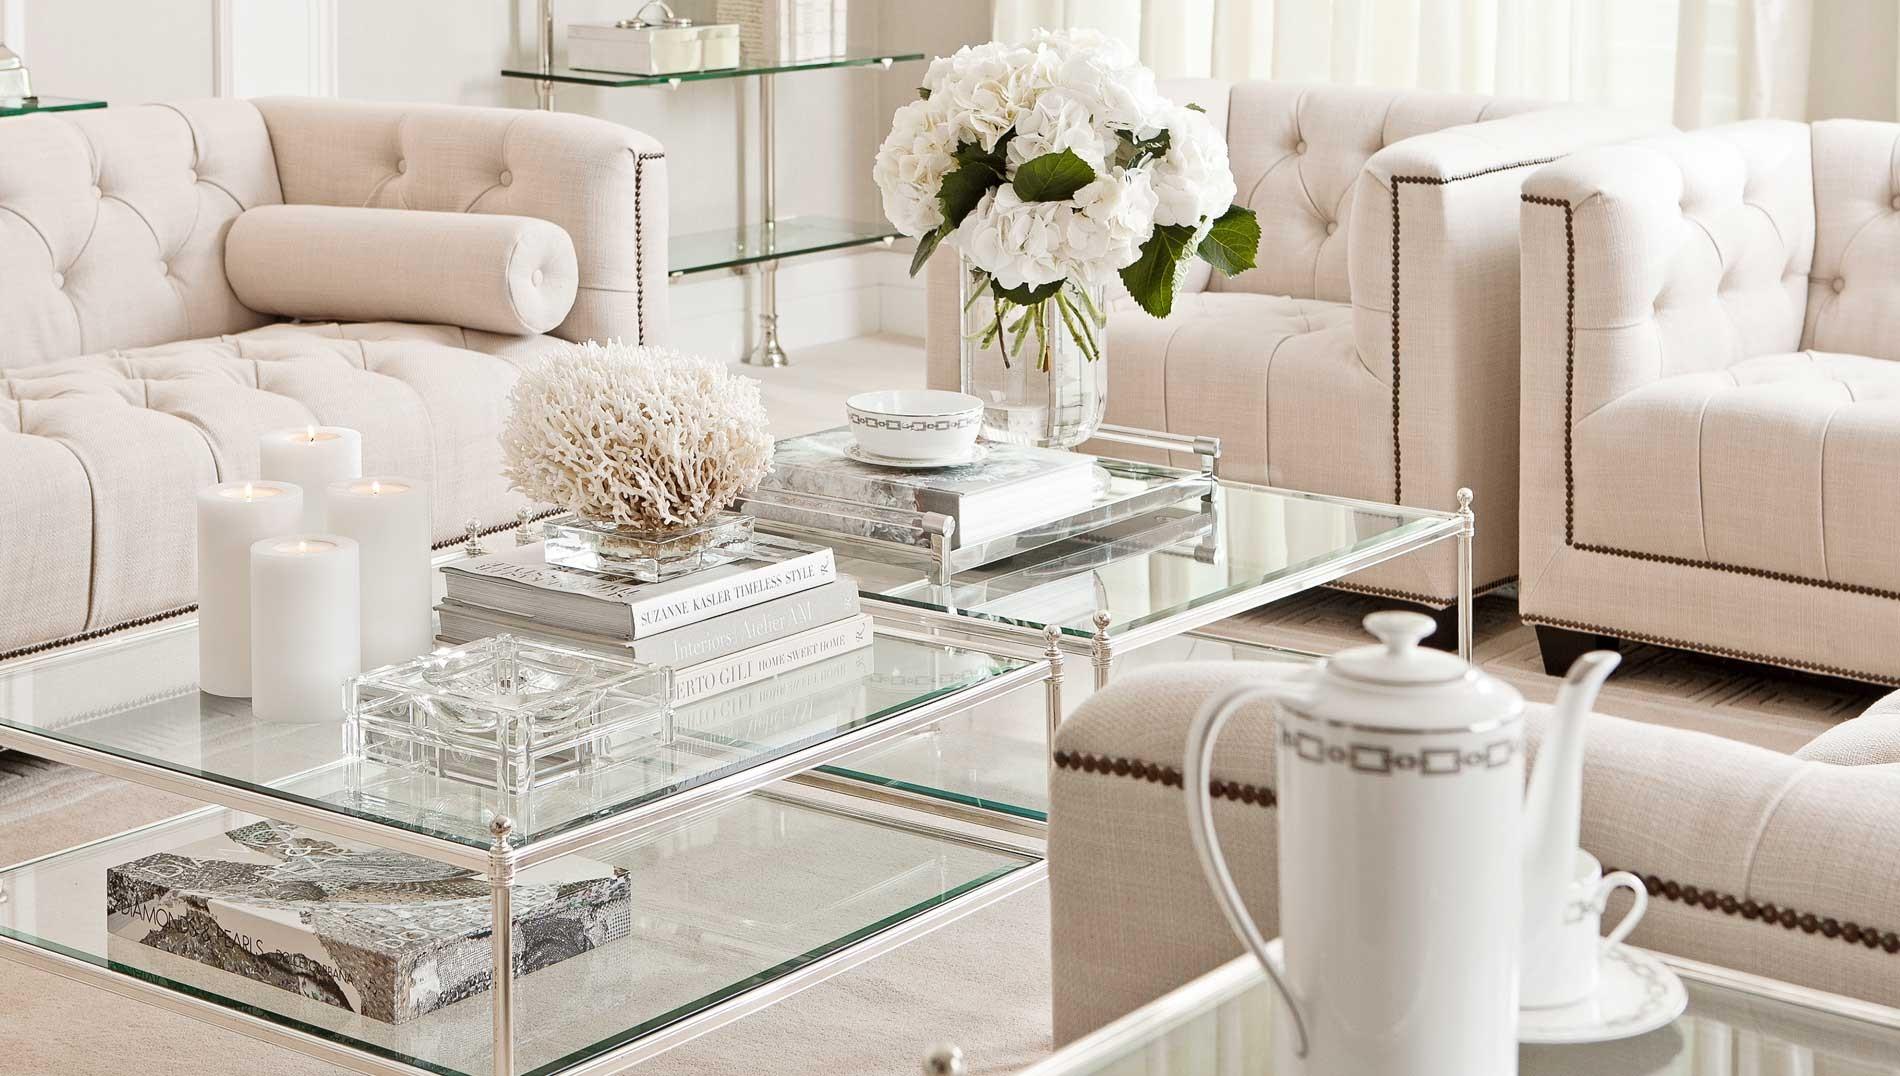 eichholtz_aubrey_coffee_table_and_paolo_armchair_-_shop_eichholtz_at_luxdeco.com_1.jpg